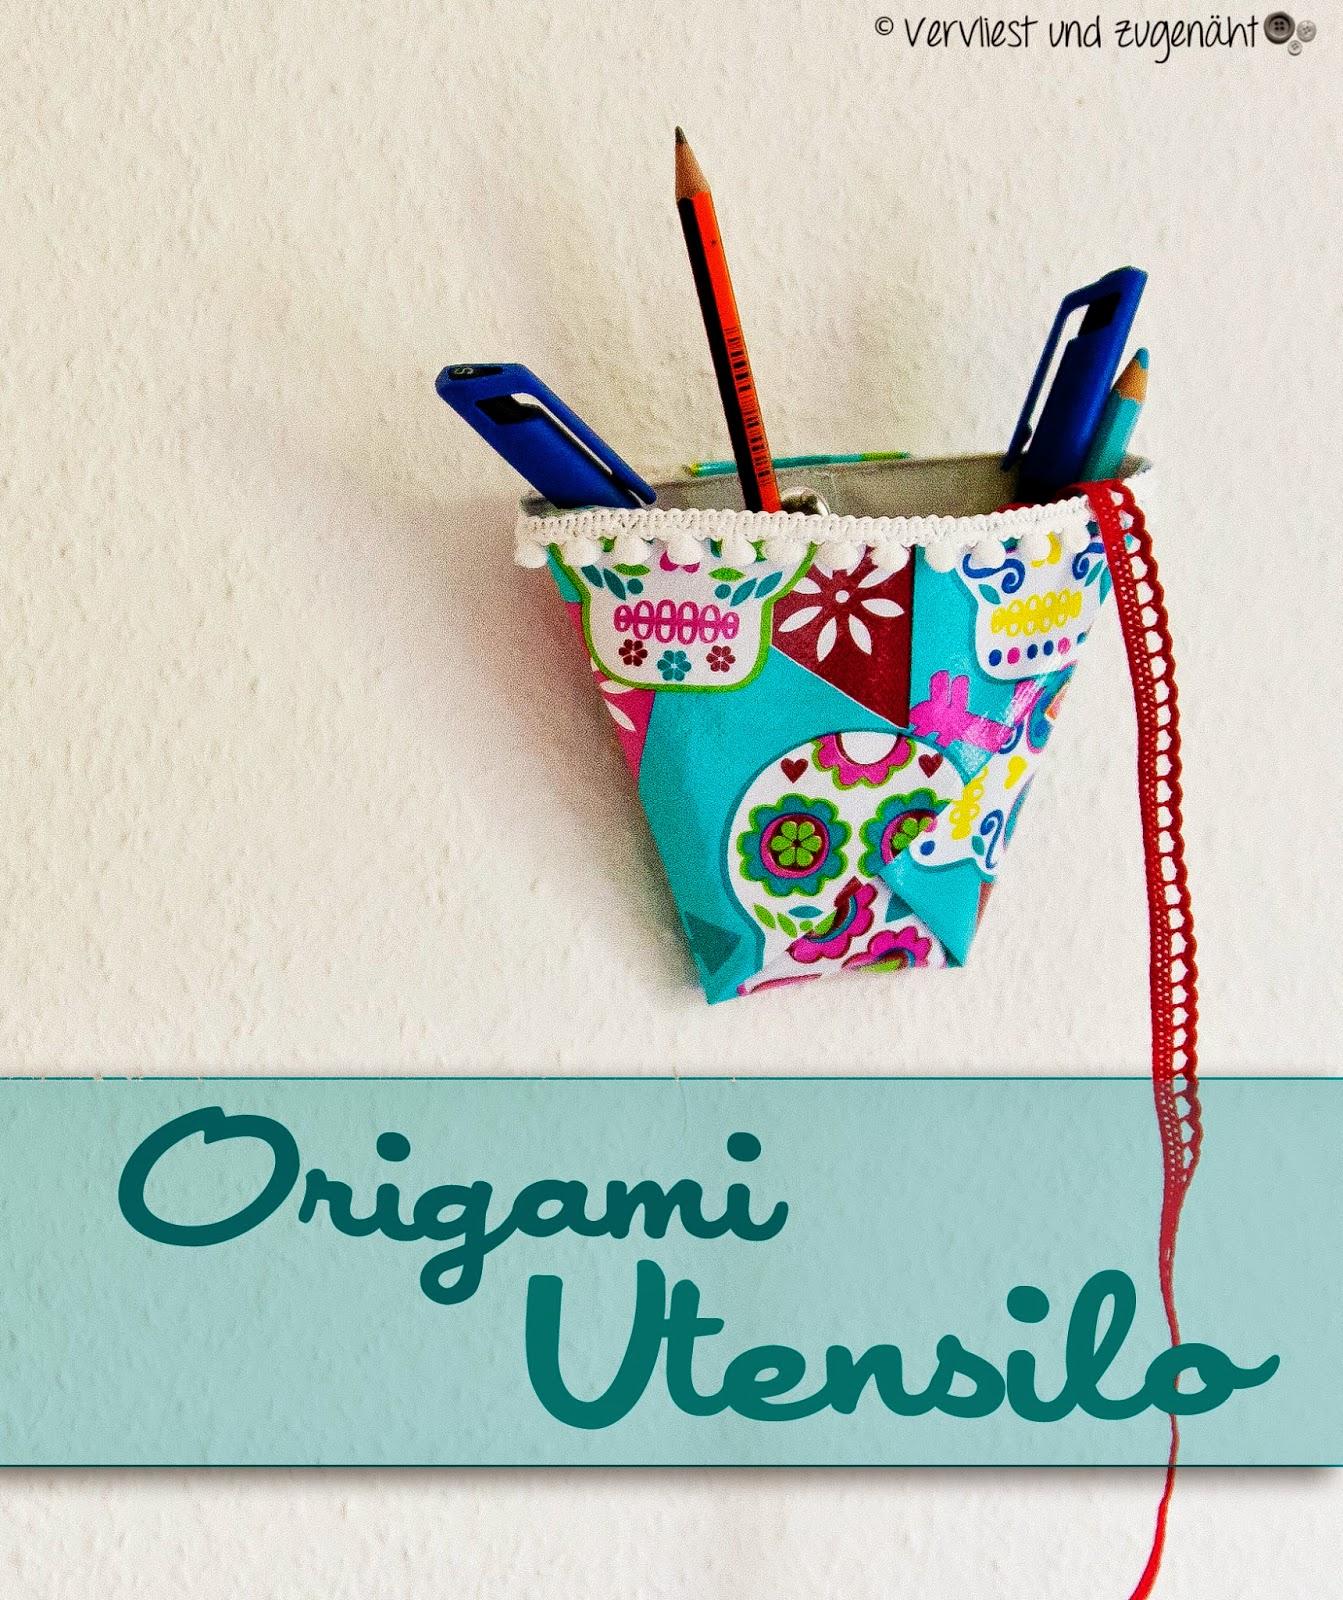 http://vervliestundzugenaeht.blogspot.de/2014/09/origami-utensilo-gastpost.html